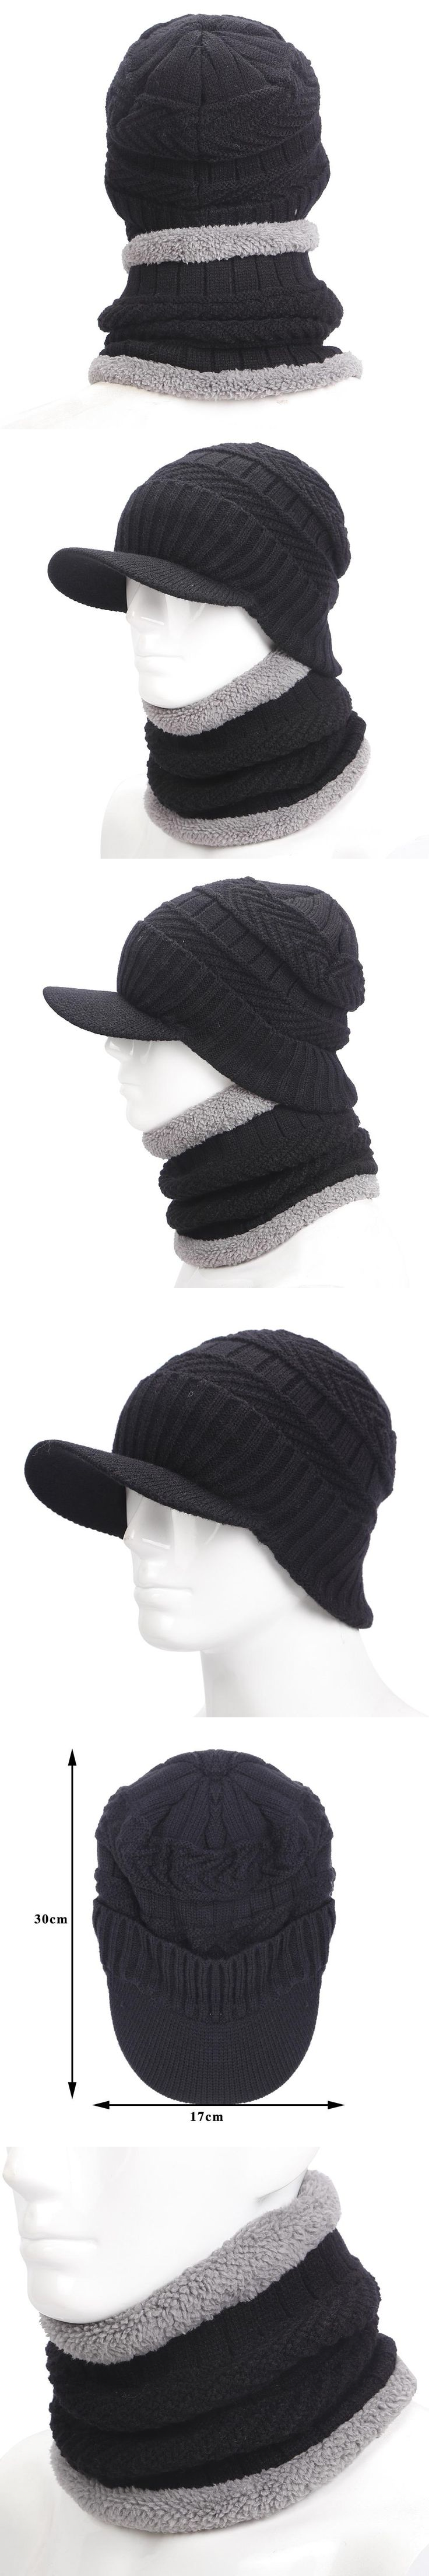 warmer winter hat knit cap scarf cap Winter Hats For men knitted hat men Beanie Knit Hat Skullies Beanies Men Beanies Cap MY